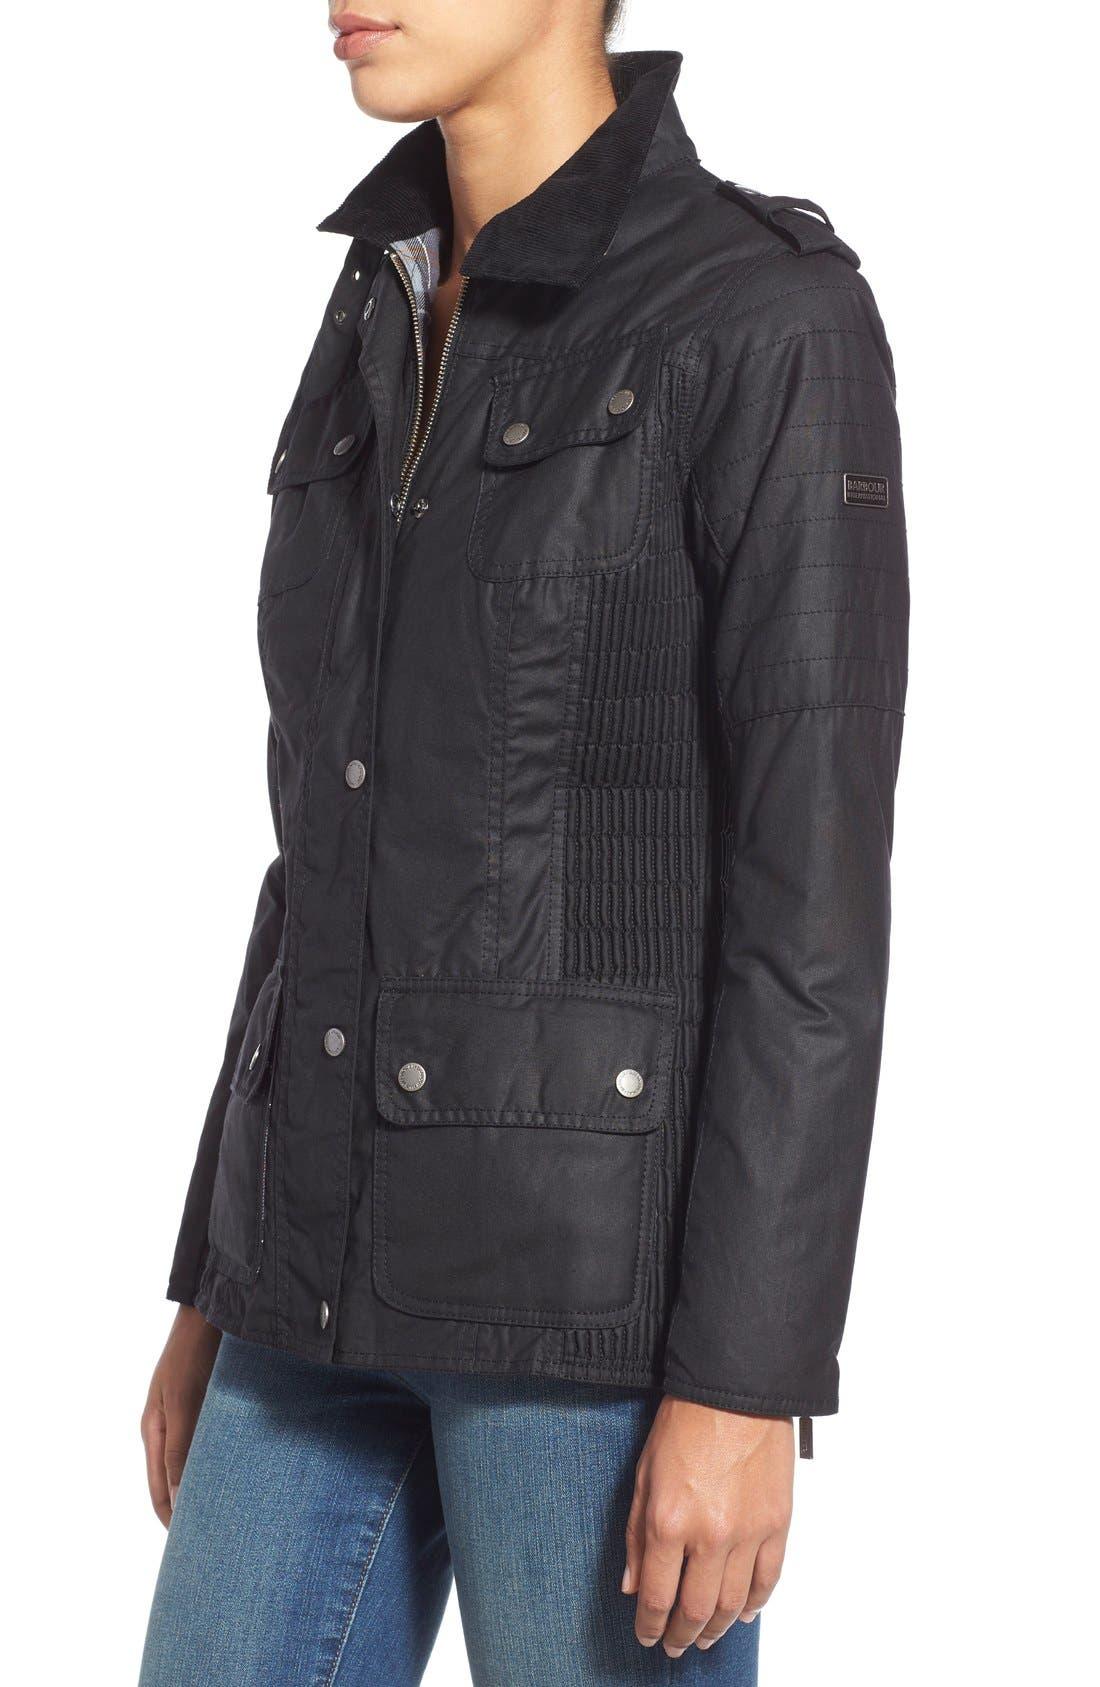 Barbour fireblade jacket